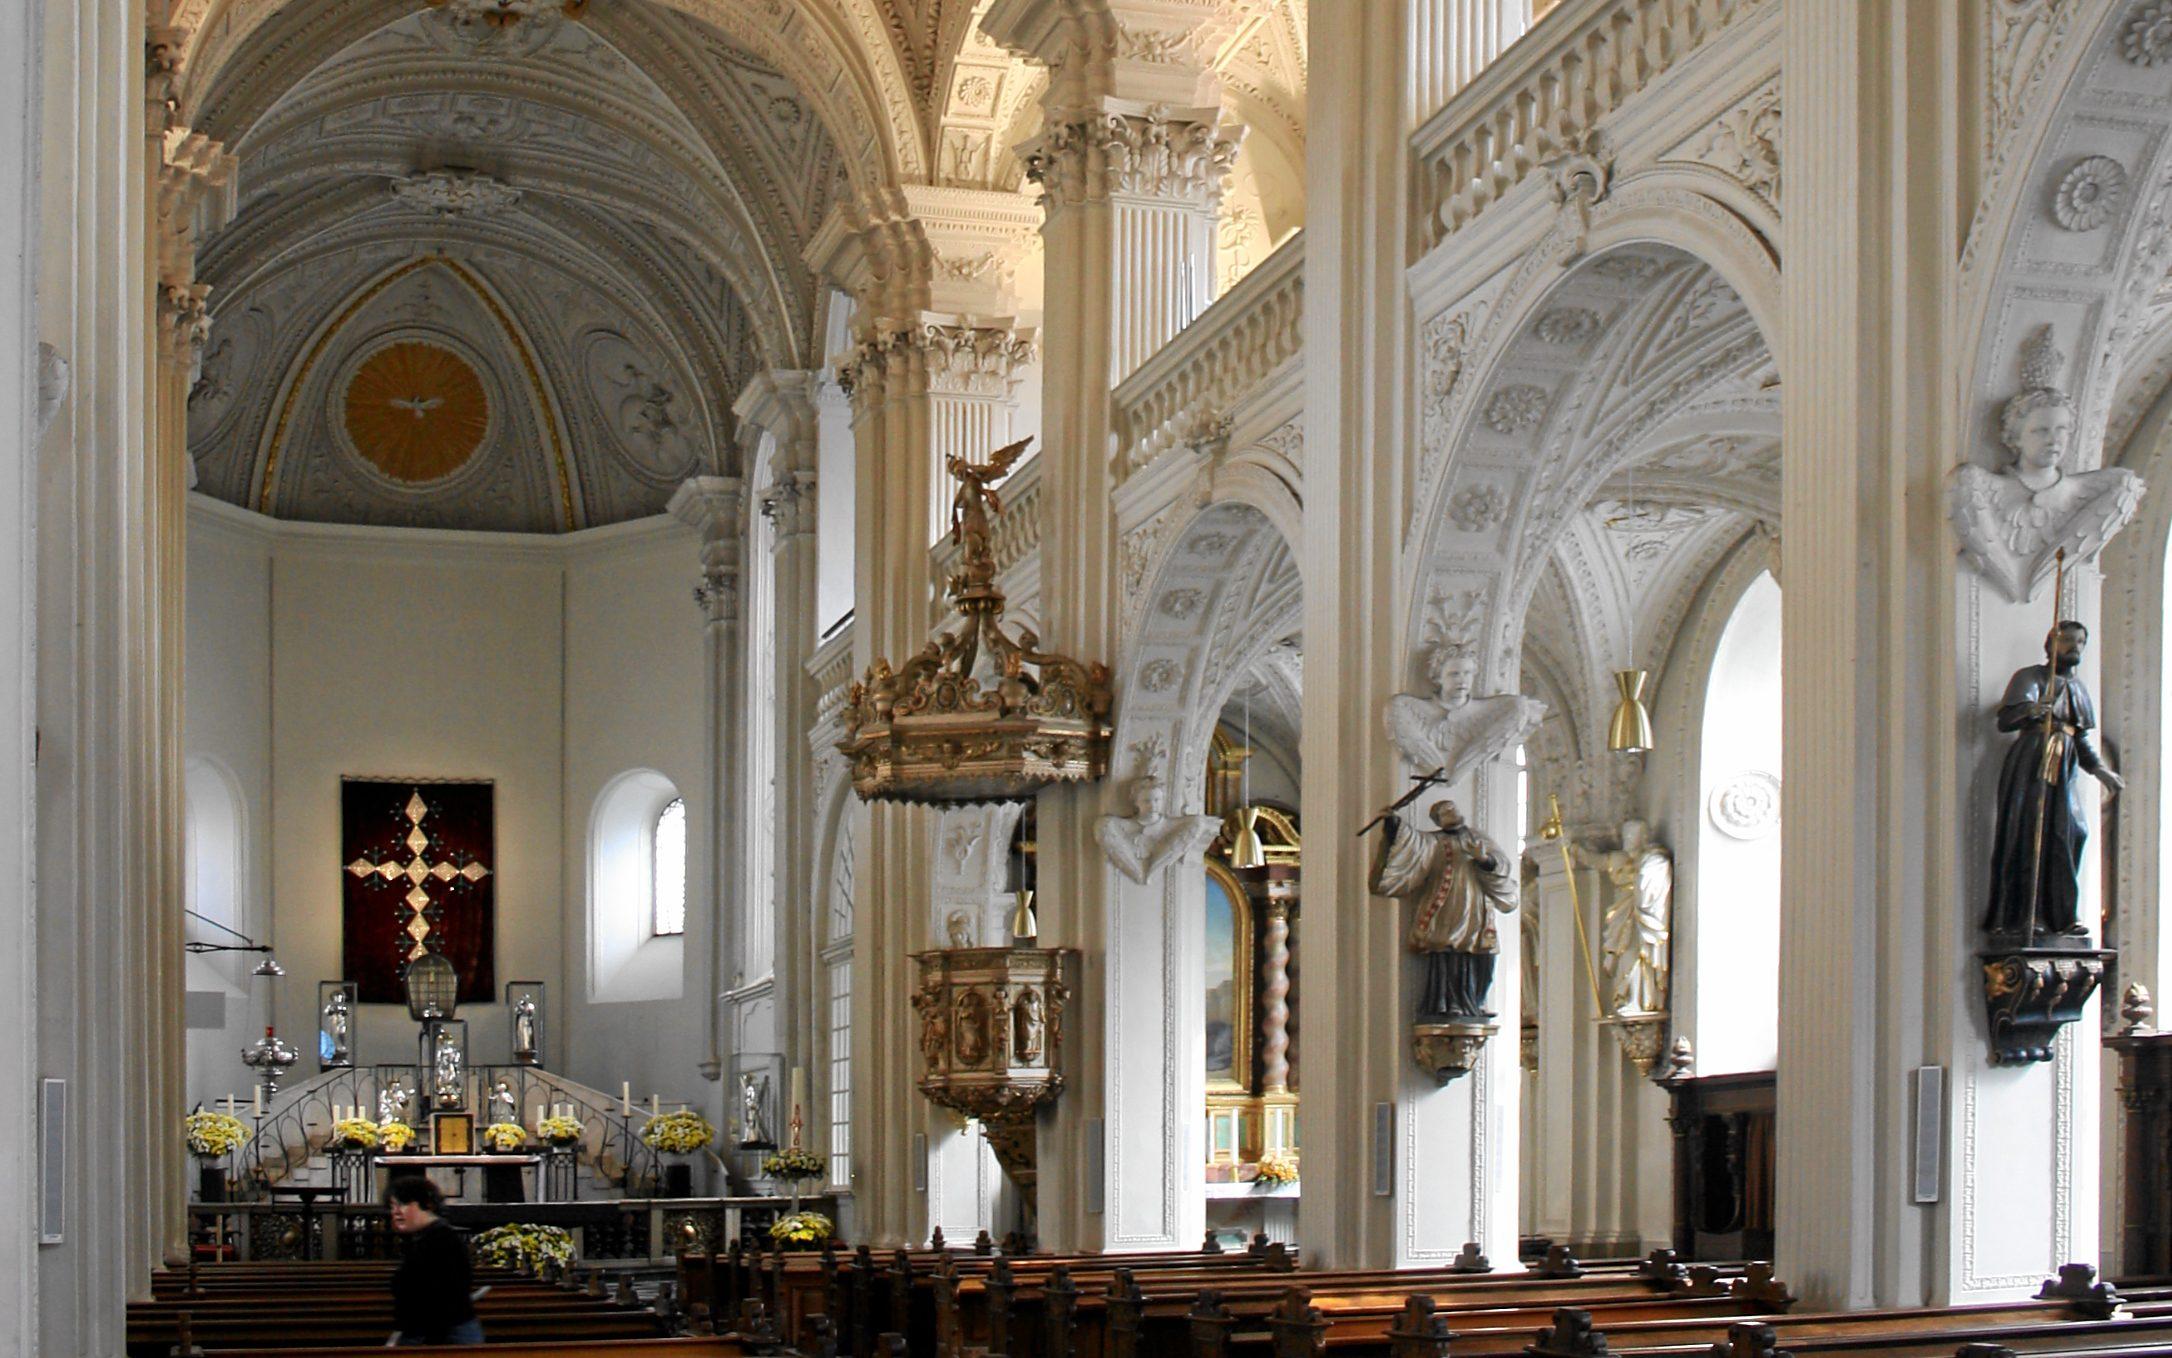 St. Andreas Church